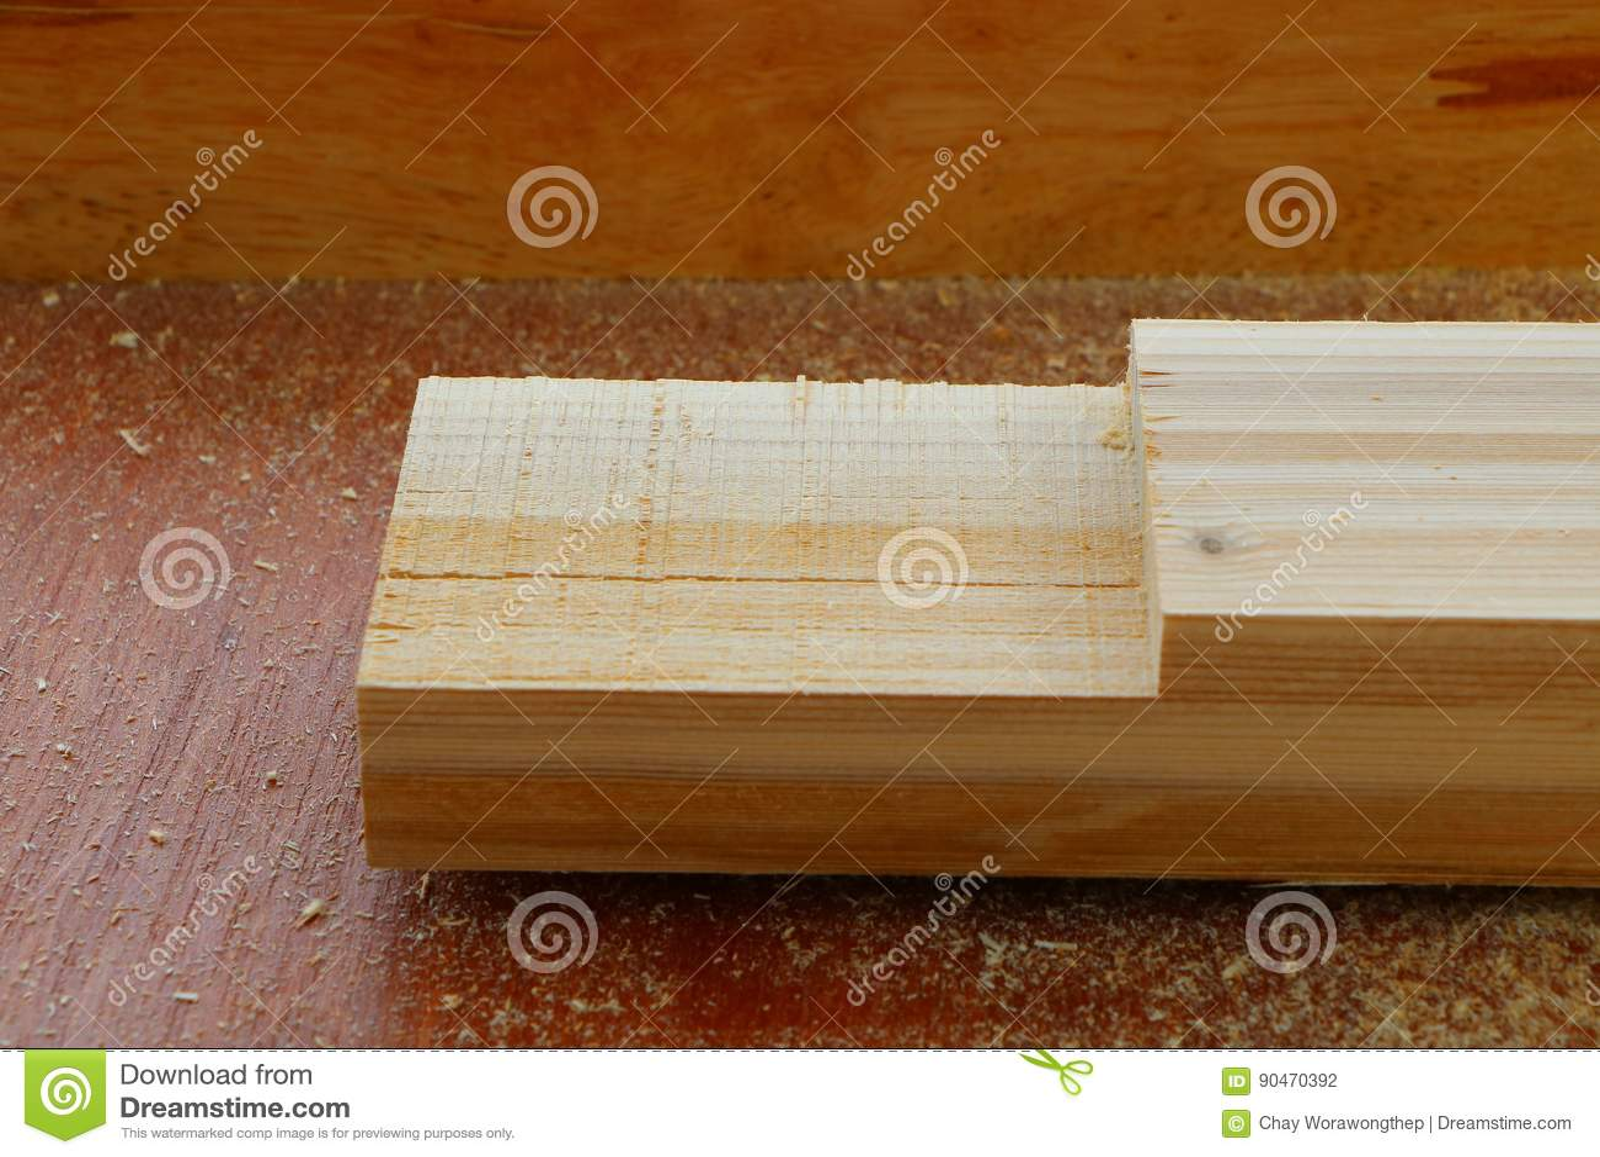 Собирая мебель, соединение шпунтины